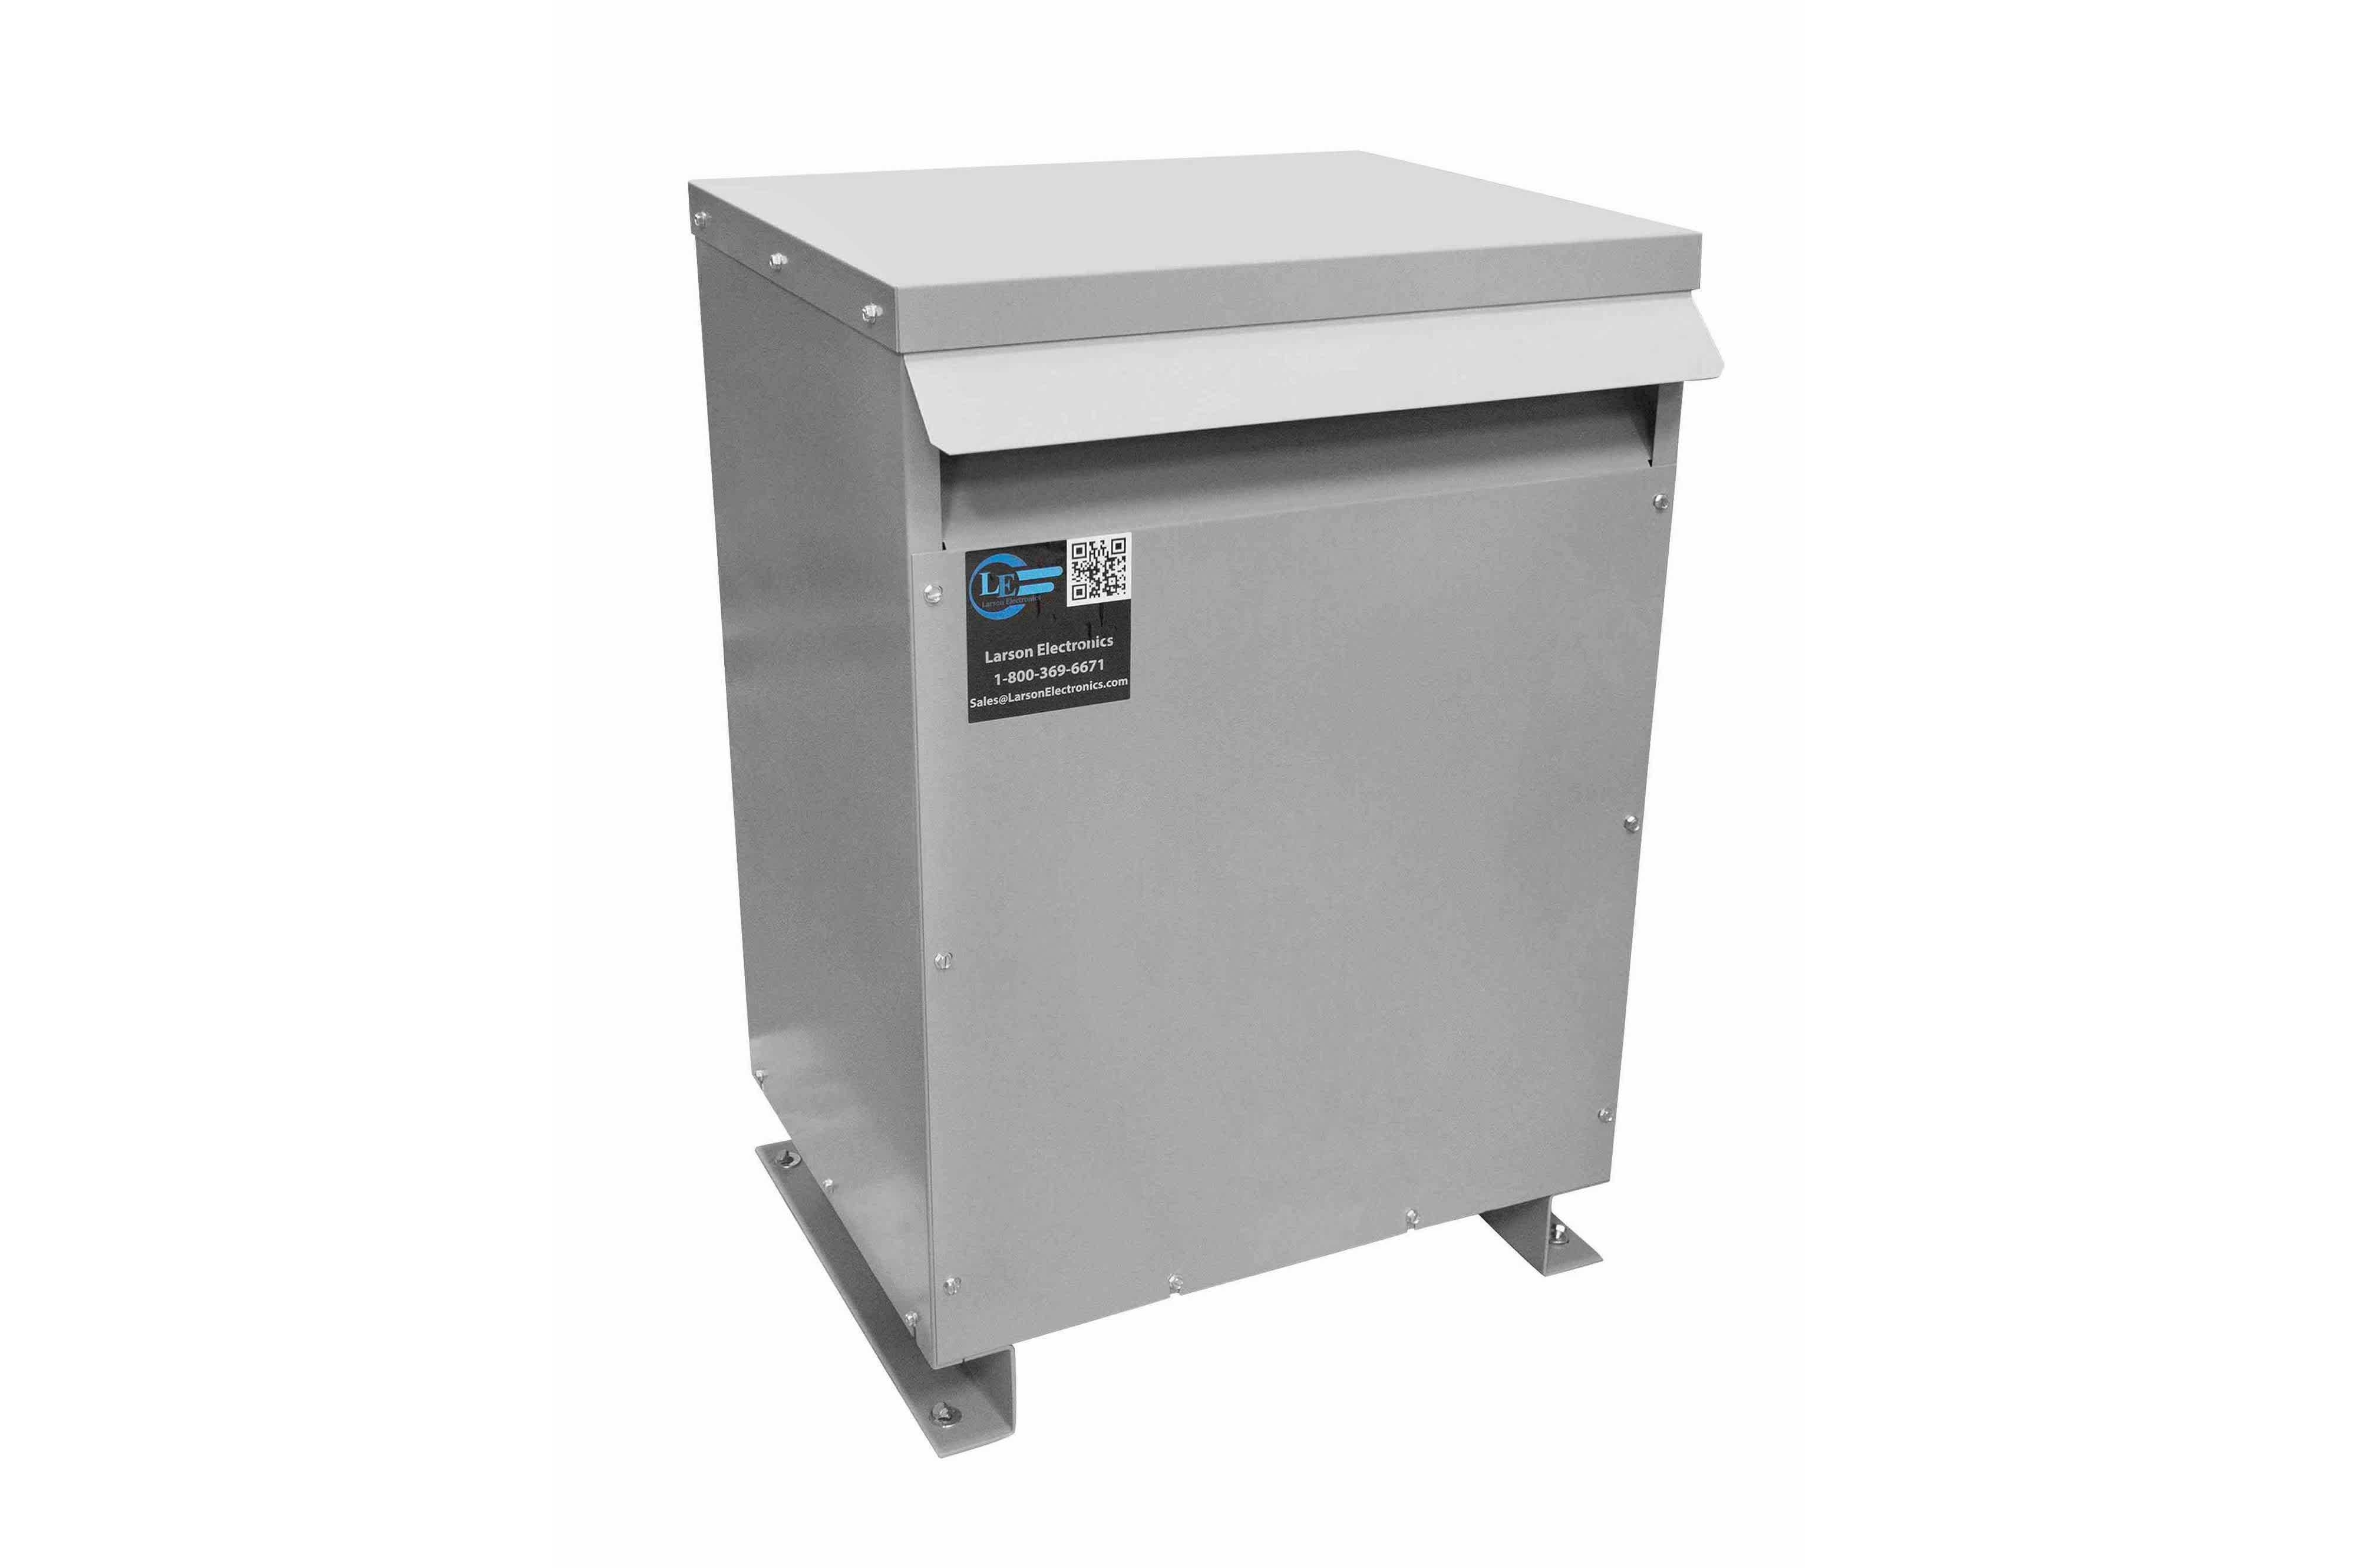 55 kVA 3PH Isolation Transformer, 230V Wye Primary, 480V Delta Secondary, N3R, Ventilated, 60 Hz